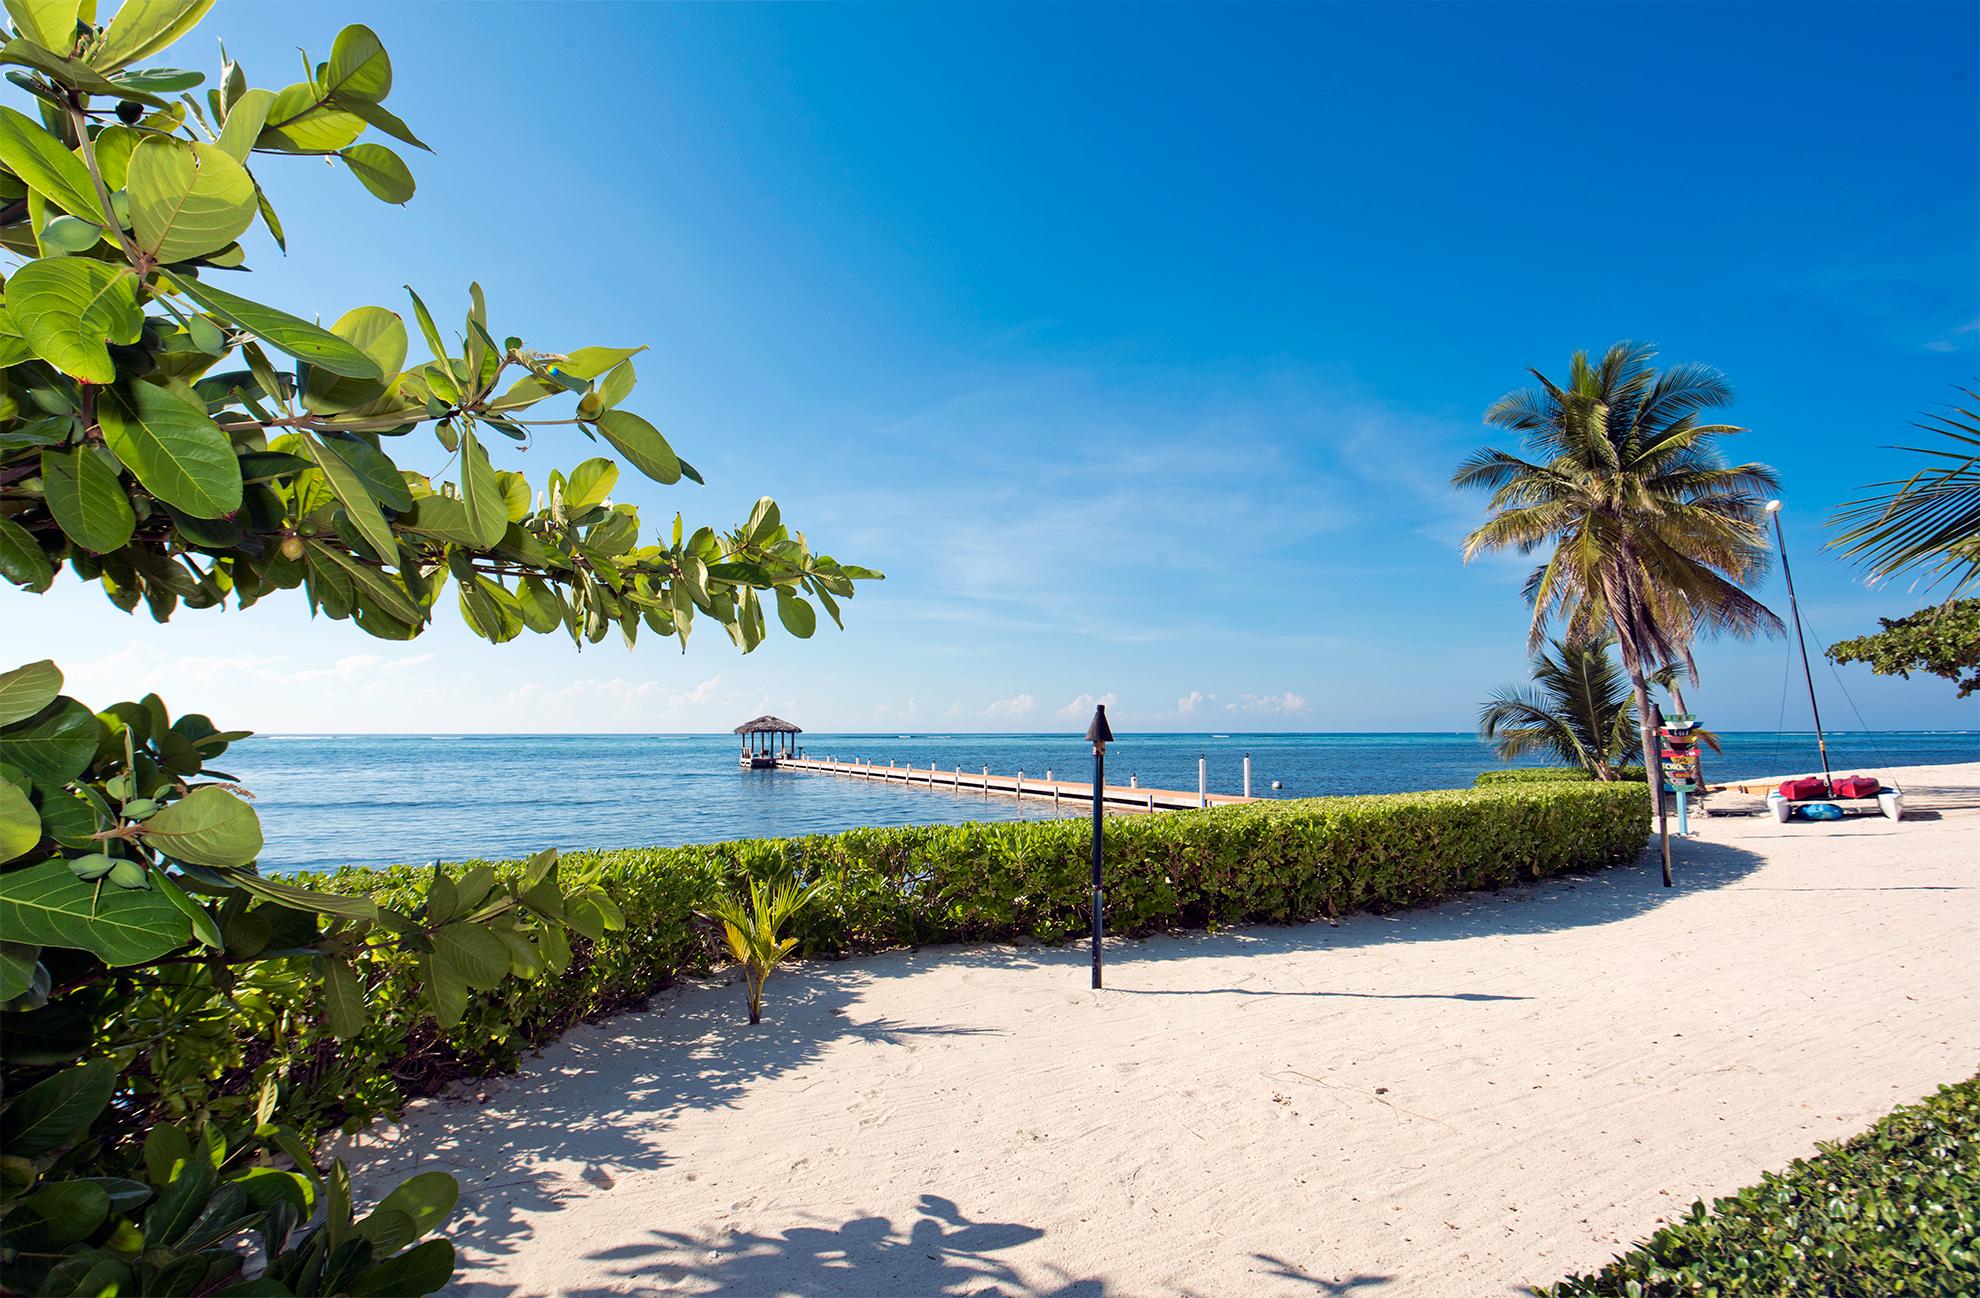 Faroway Beach